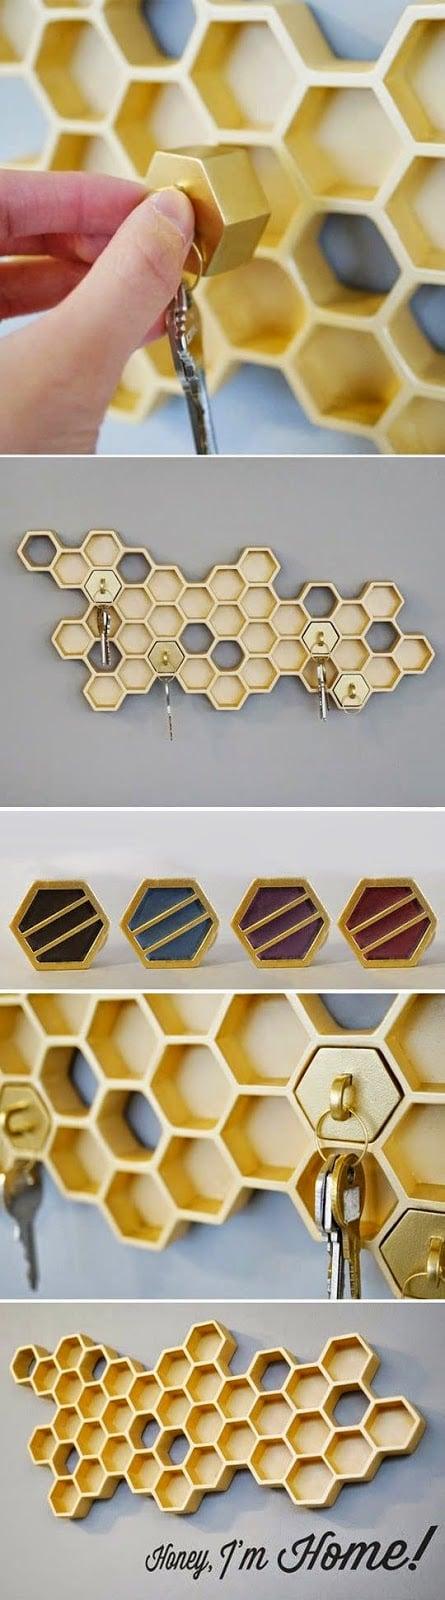 51 do it yourself m bel hacks zum nachmachen diy m bel zenideen. Black Bedroom Furniture Sets. Home Design Ideas